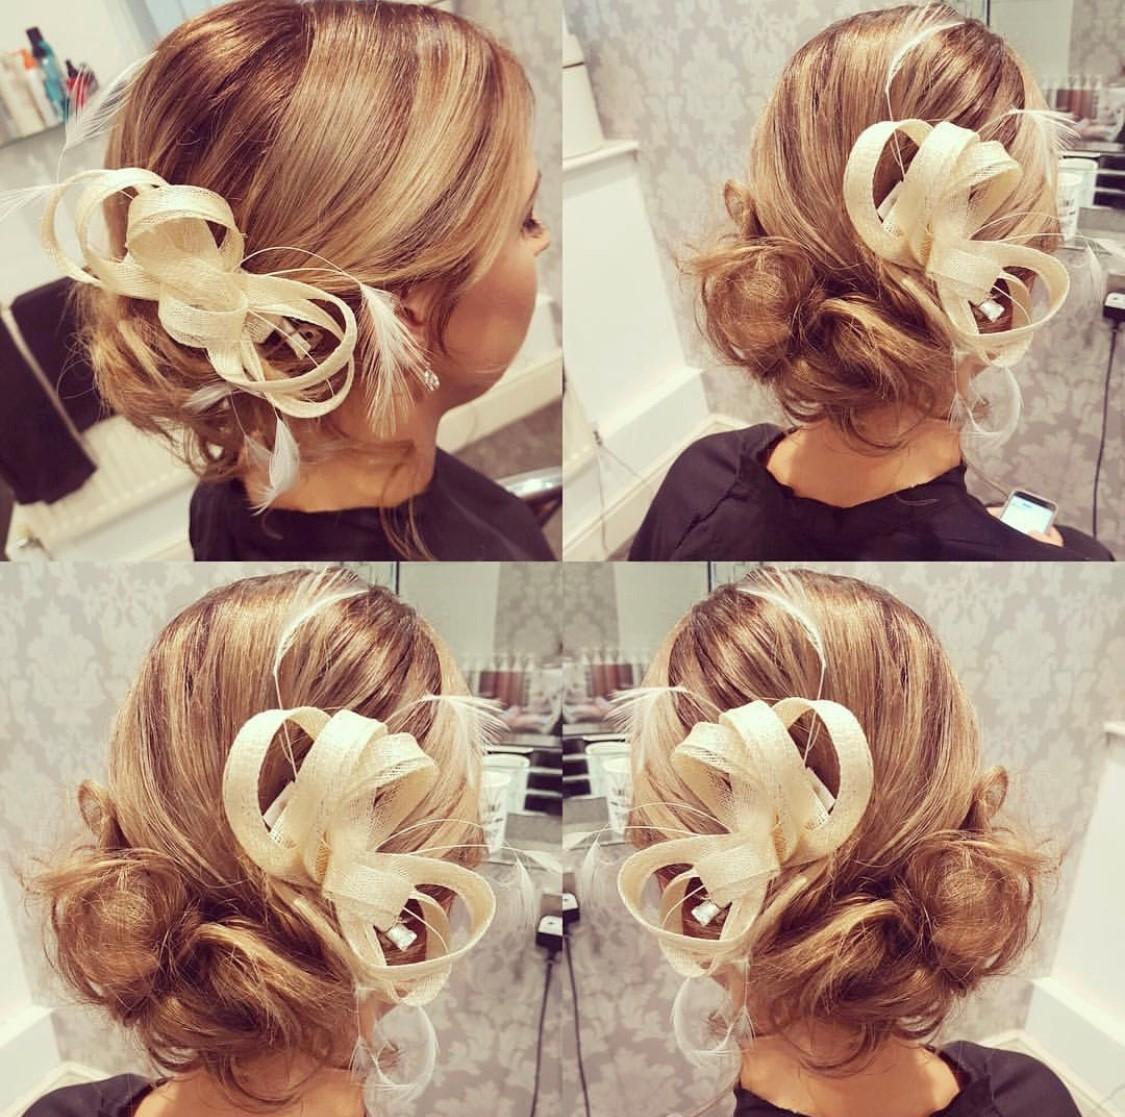 Genesis Hair and Beauty